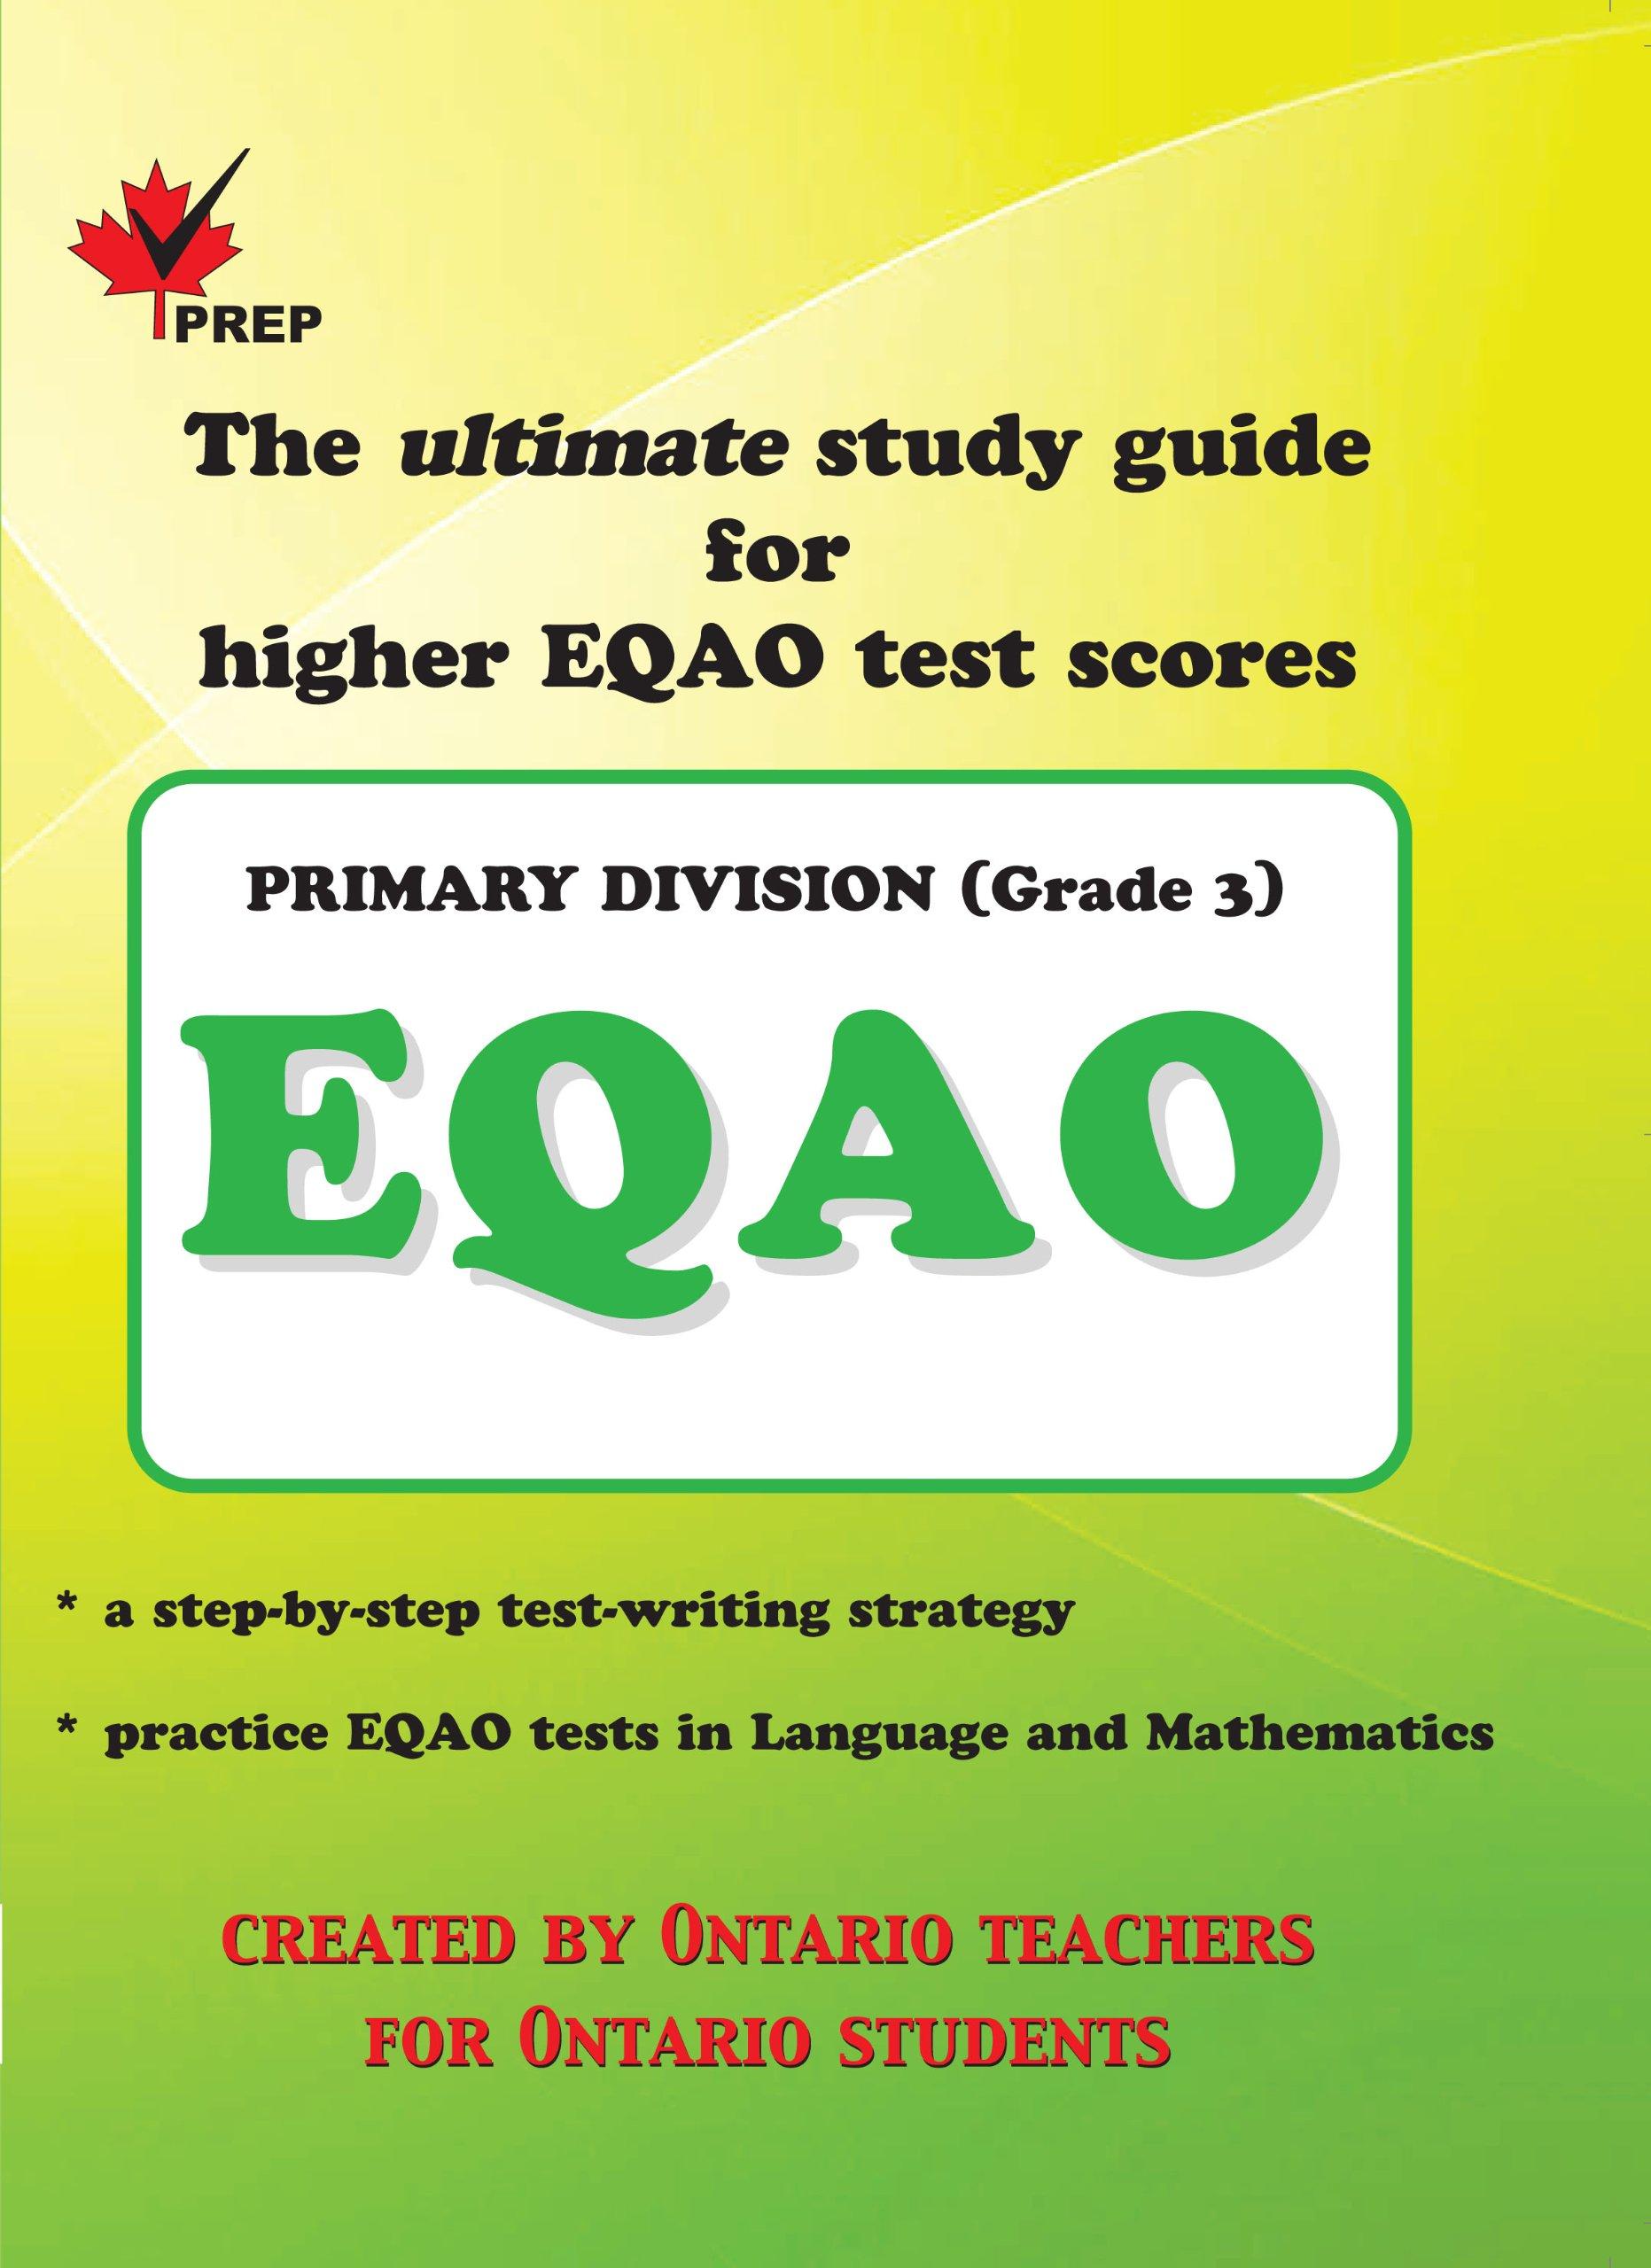 worksheet Eqao Grade 3 Worksheets grade 3 eqao summer advantage dr d mullin 9781897440124 books amazon ca